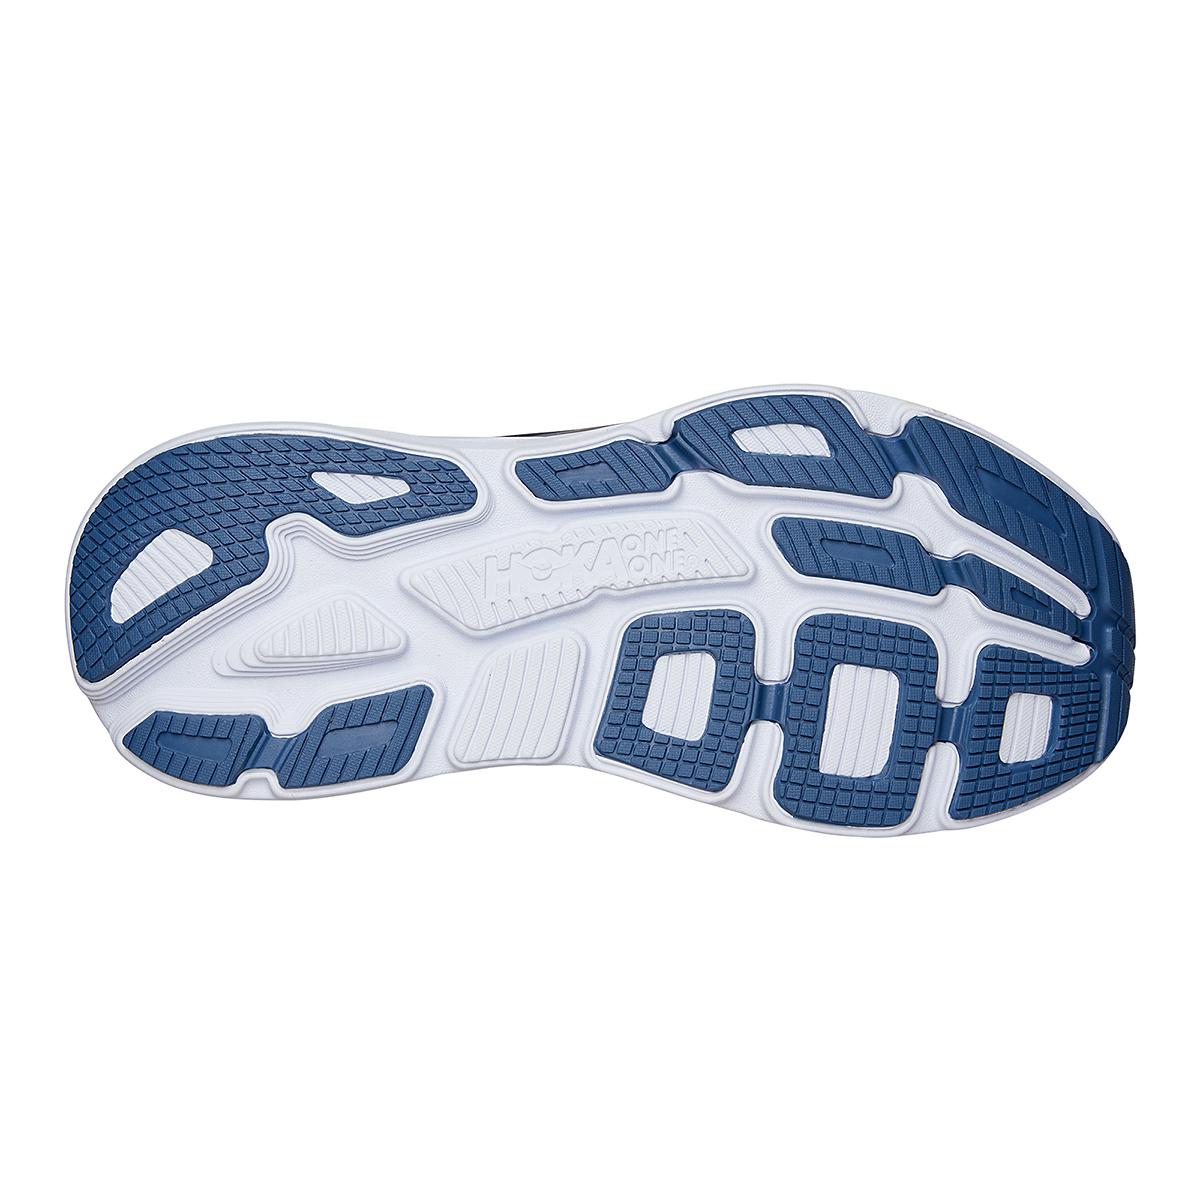 Men's Hoka One One Bondi 7 Running Shoe - Color: Ombre Blue/Provincial Blue - Size: 7 - Width: Regular, Ombre Blue/Provincial Blue, large, image 6